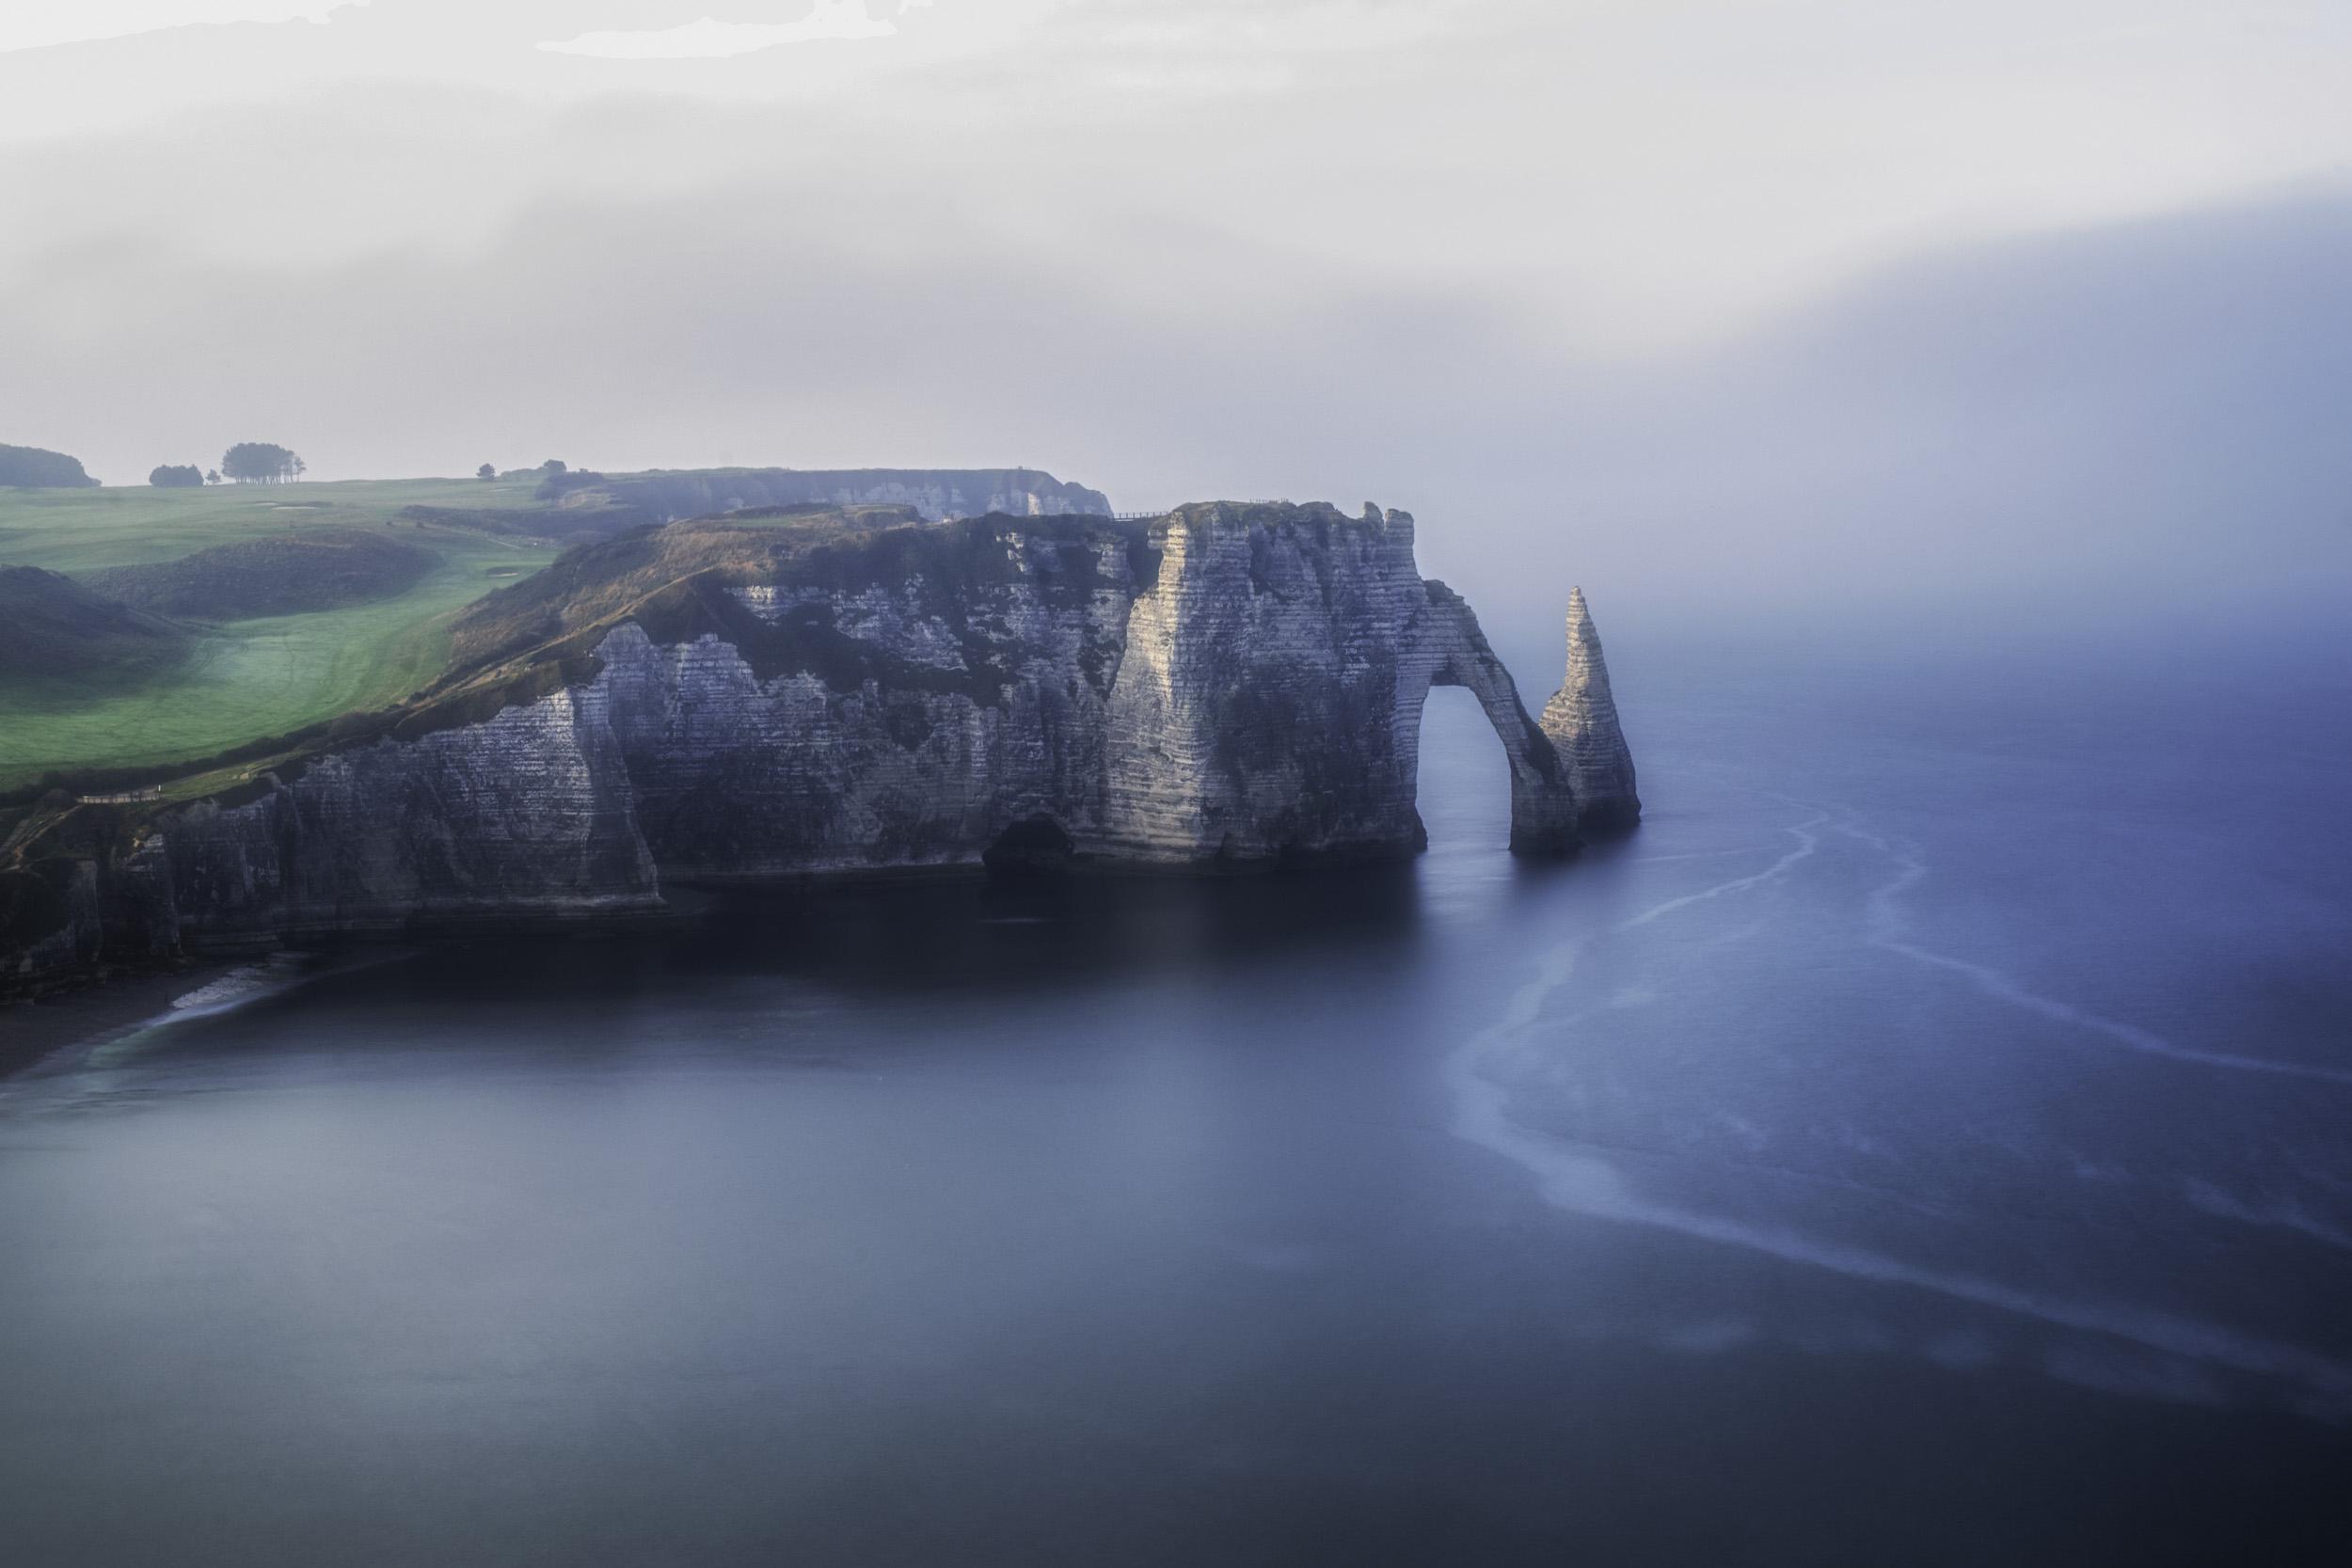 Wallpaper Etretat Normandie France Europe Falaises Mer Eau